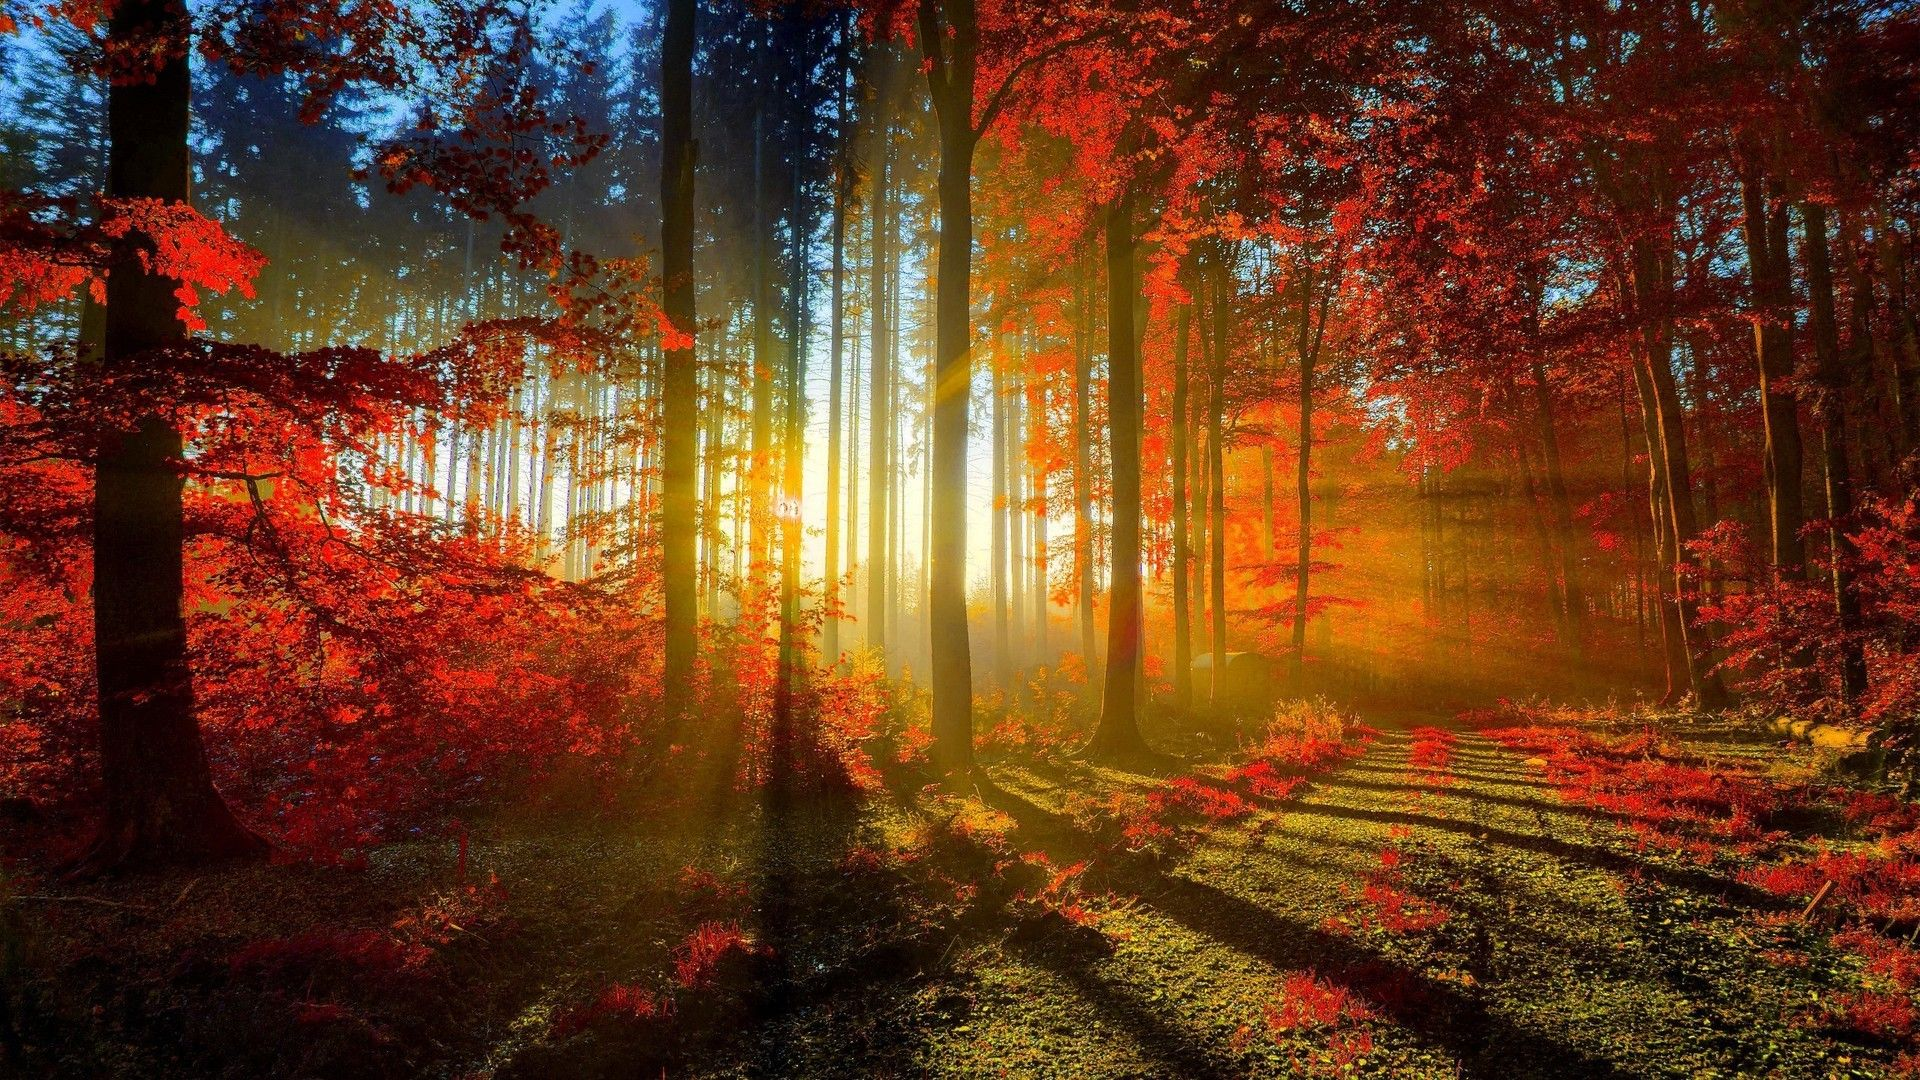 Hd wallpaper of nature - Beautiful Nature Wallpaper